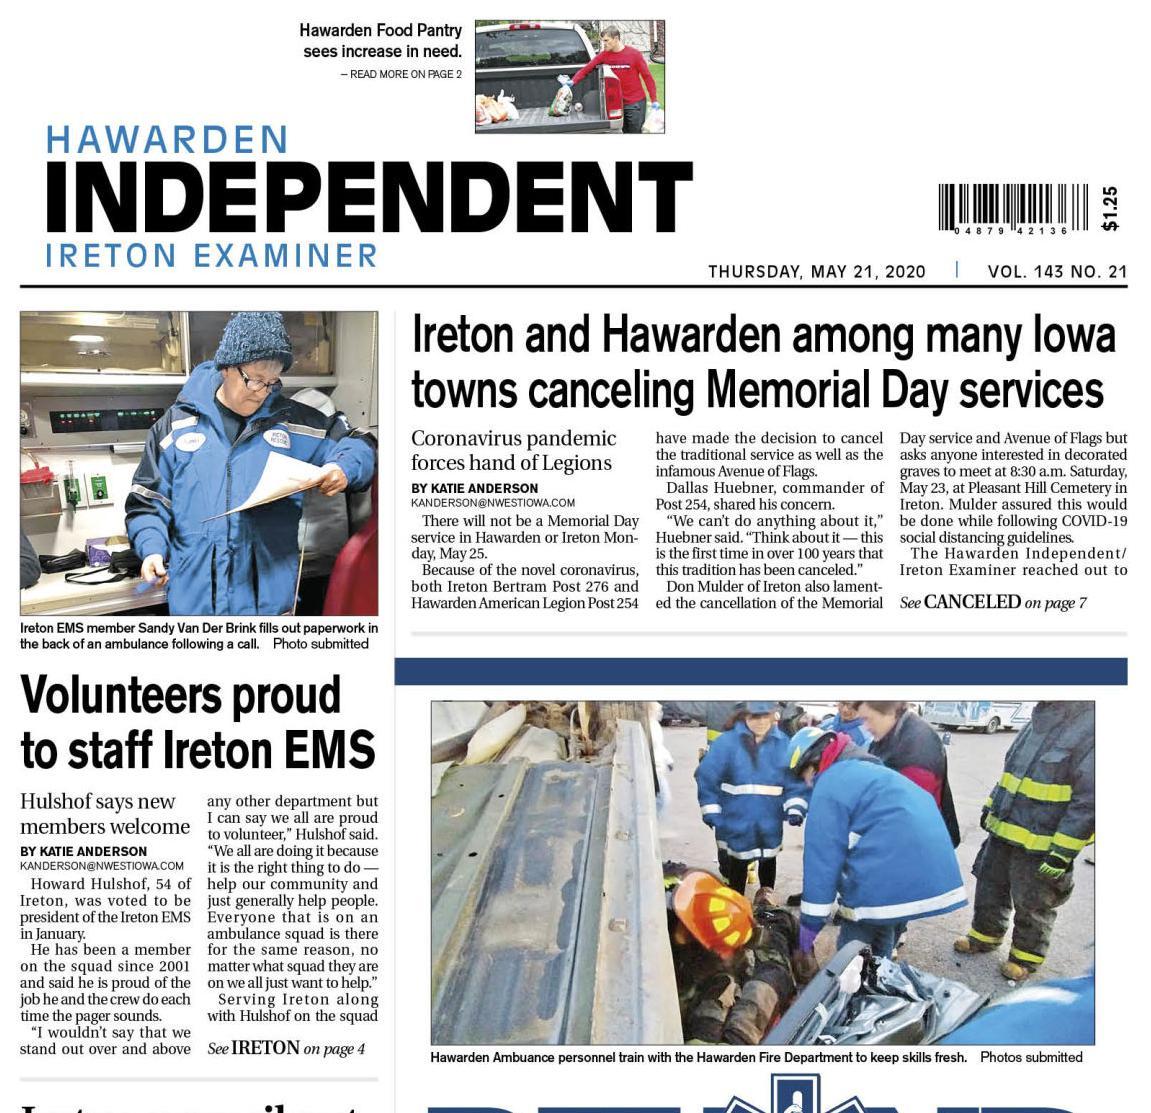 Hawarden Independent/Ireton Examiner MAY 21, 2020